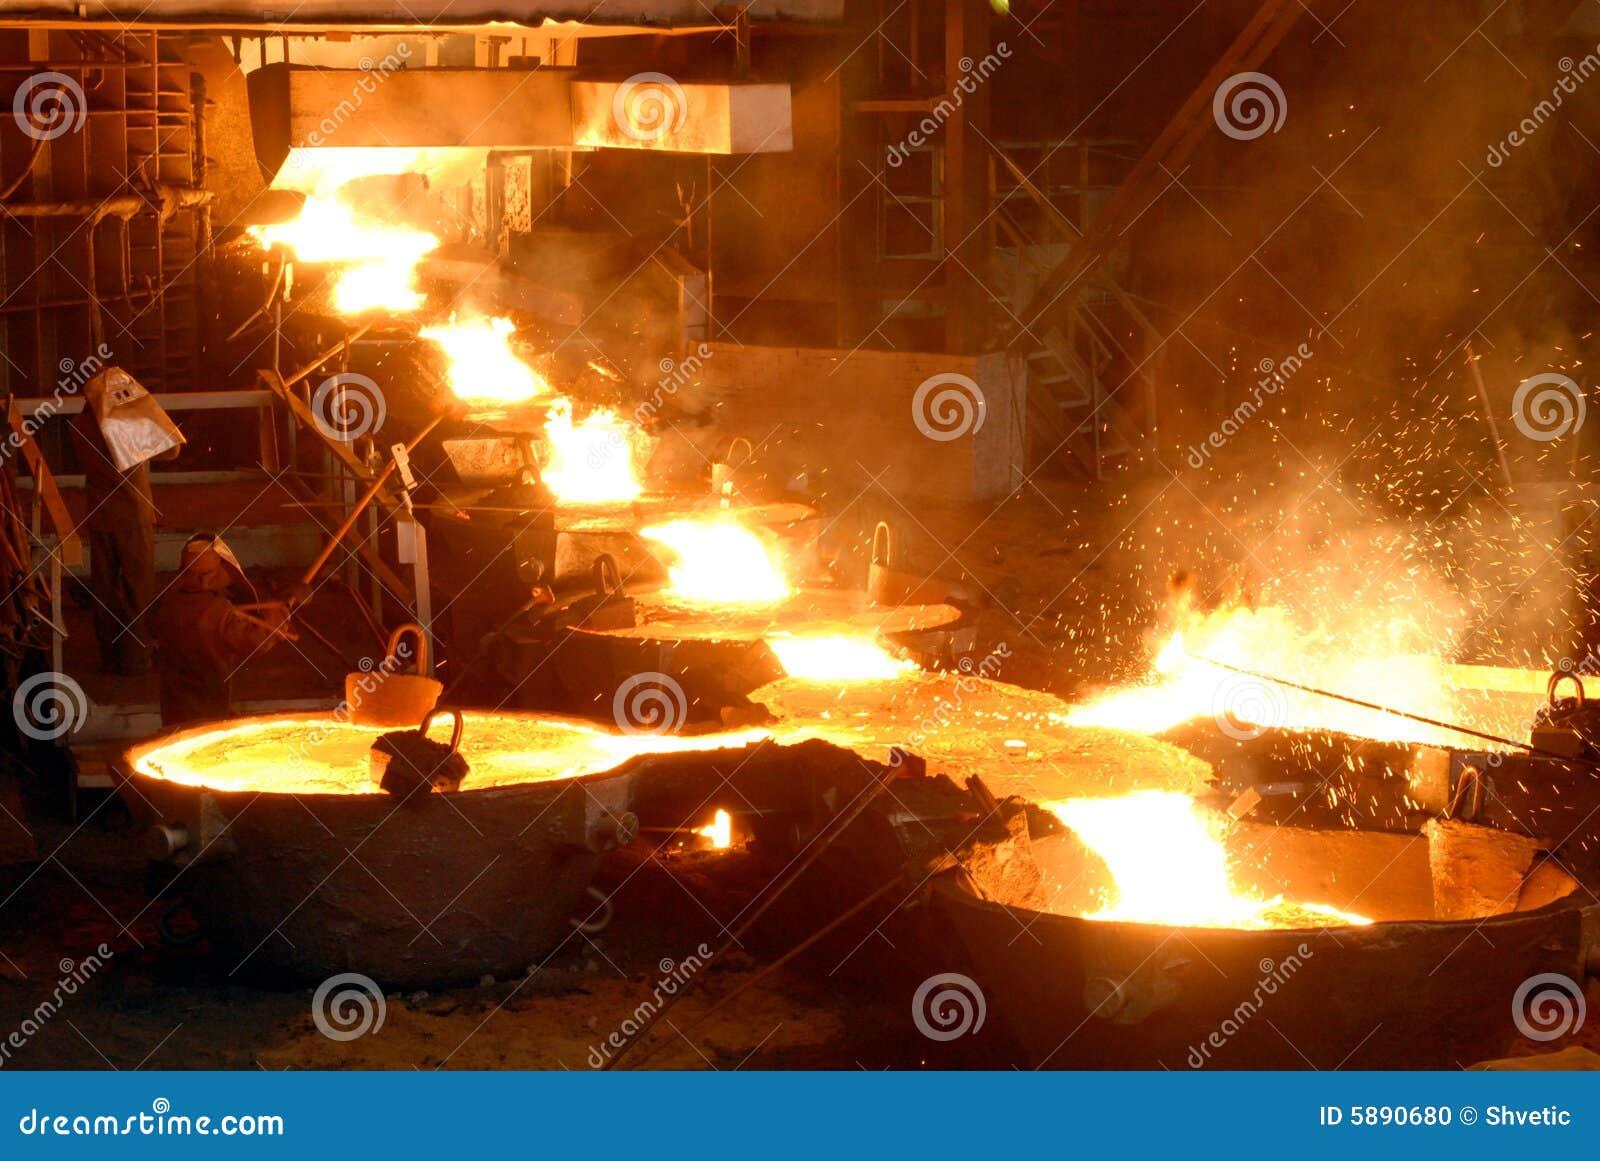 Industriële metallurgie